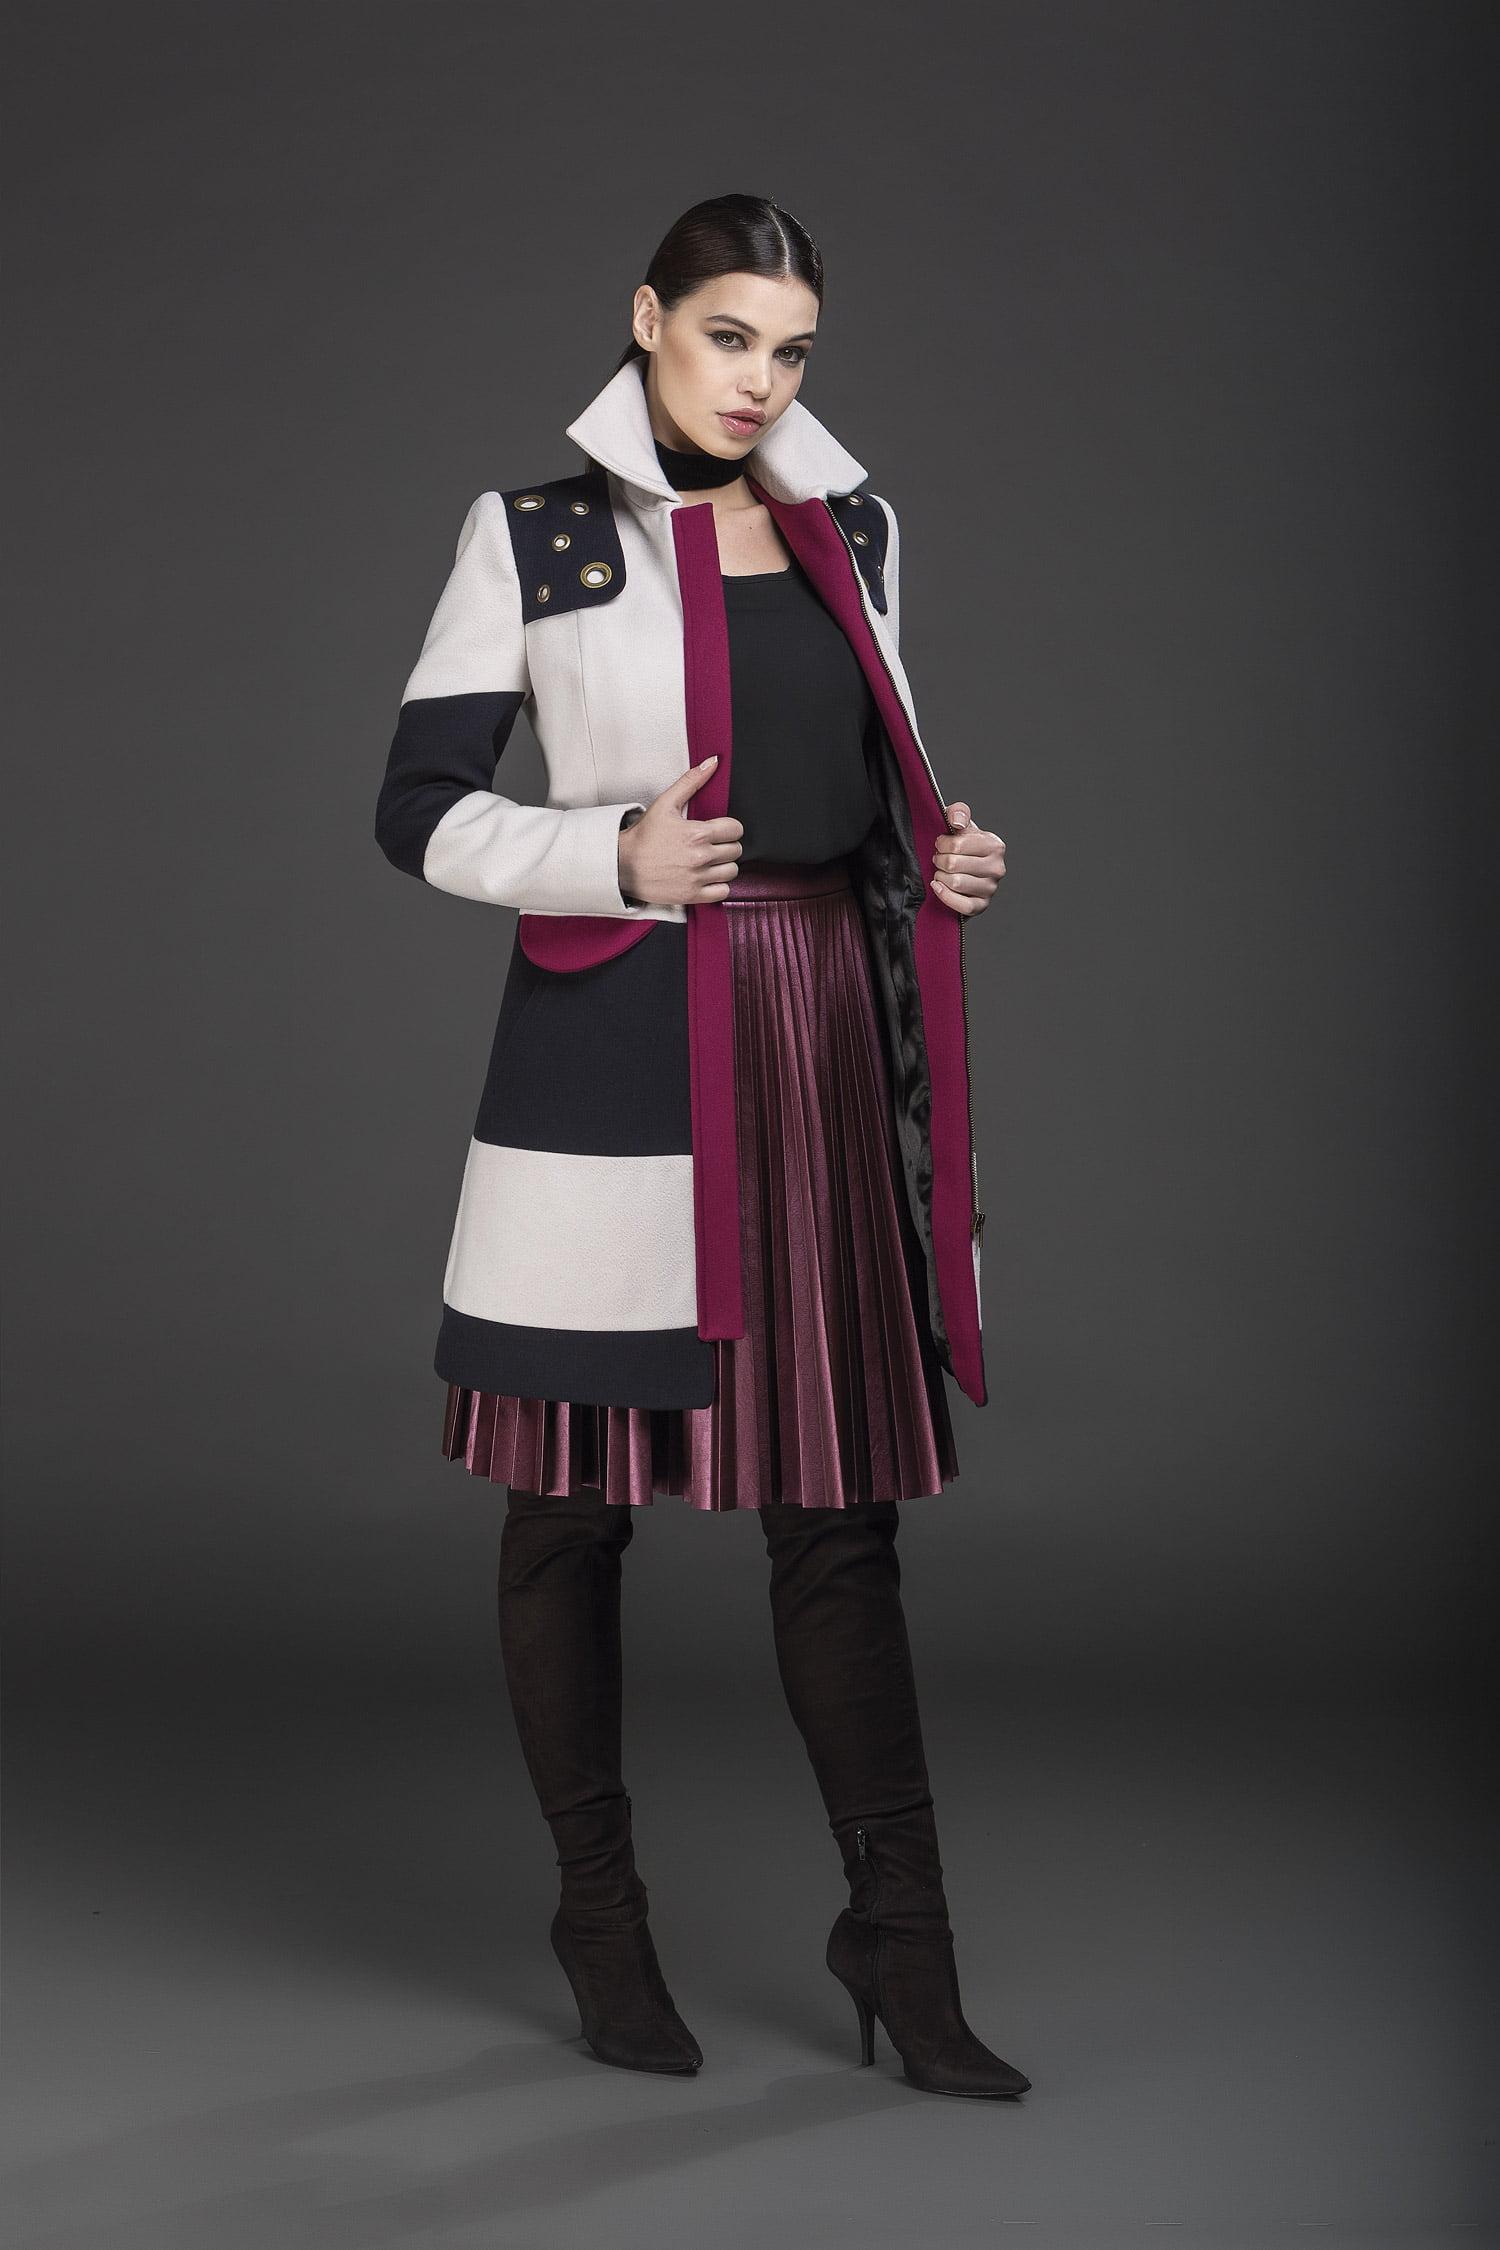 Casaco de lã bloco de cores rosa